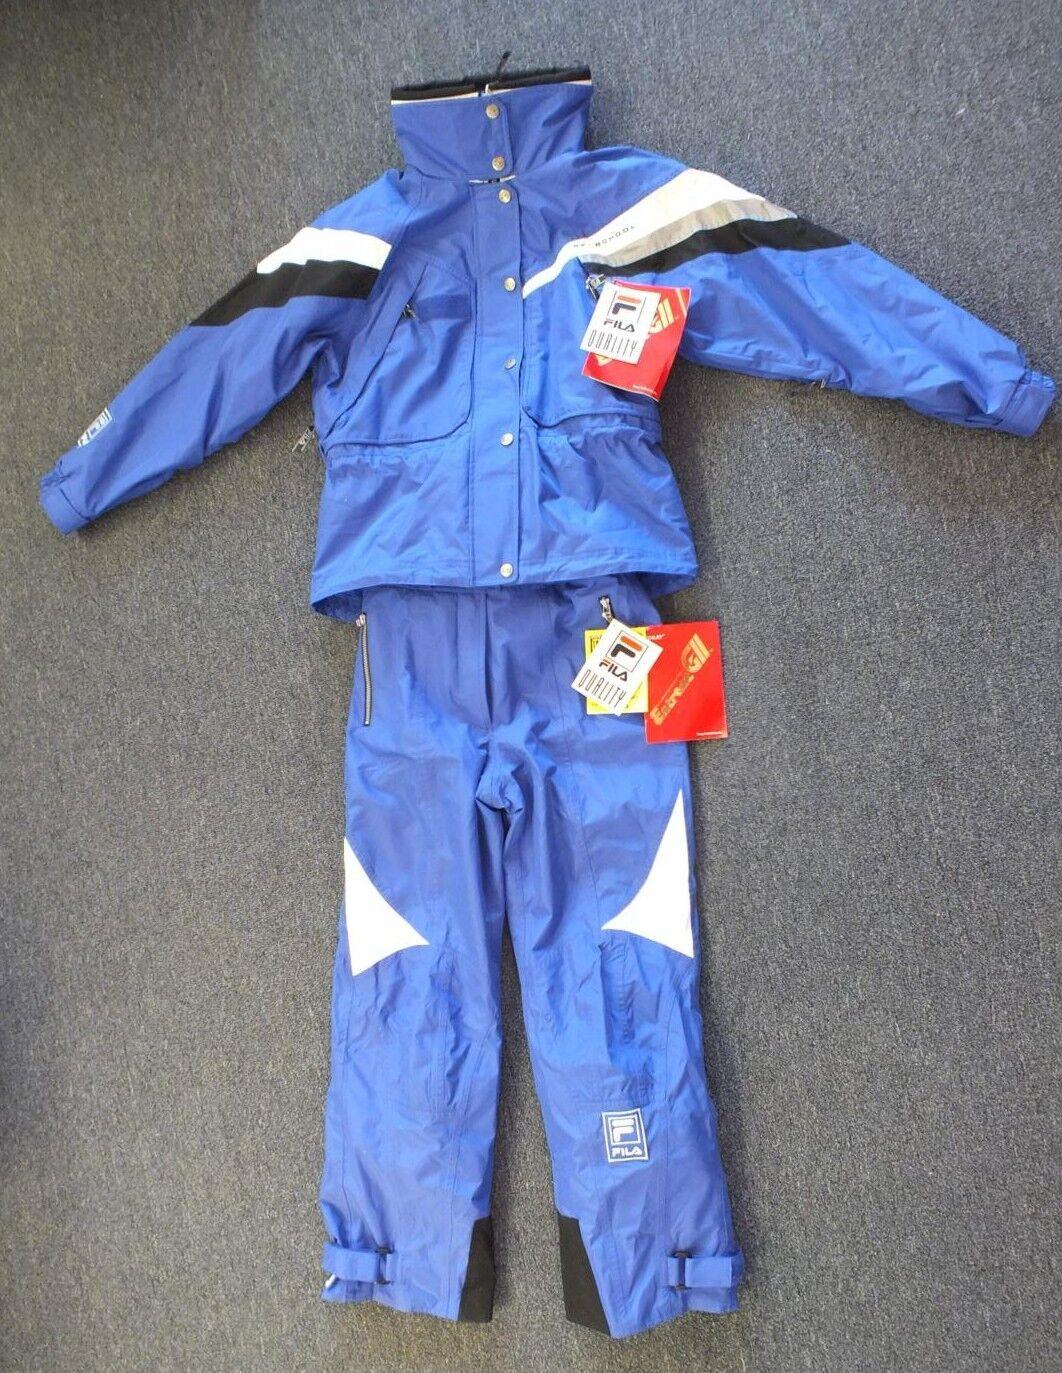 Fila Vail Beaver Creek High Quality 2 Part Entrant GII Ski School Suit NEW Wmn 8